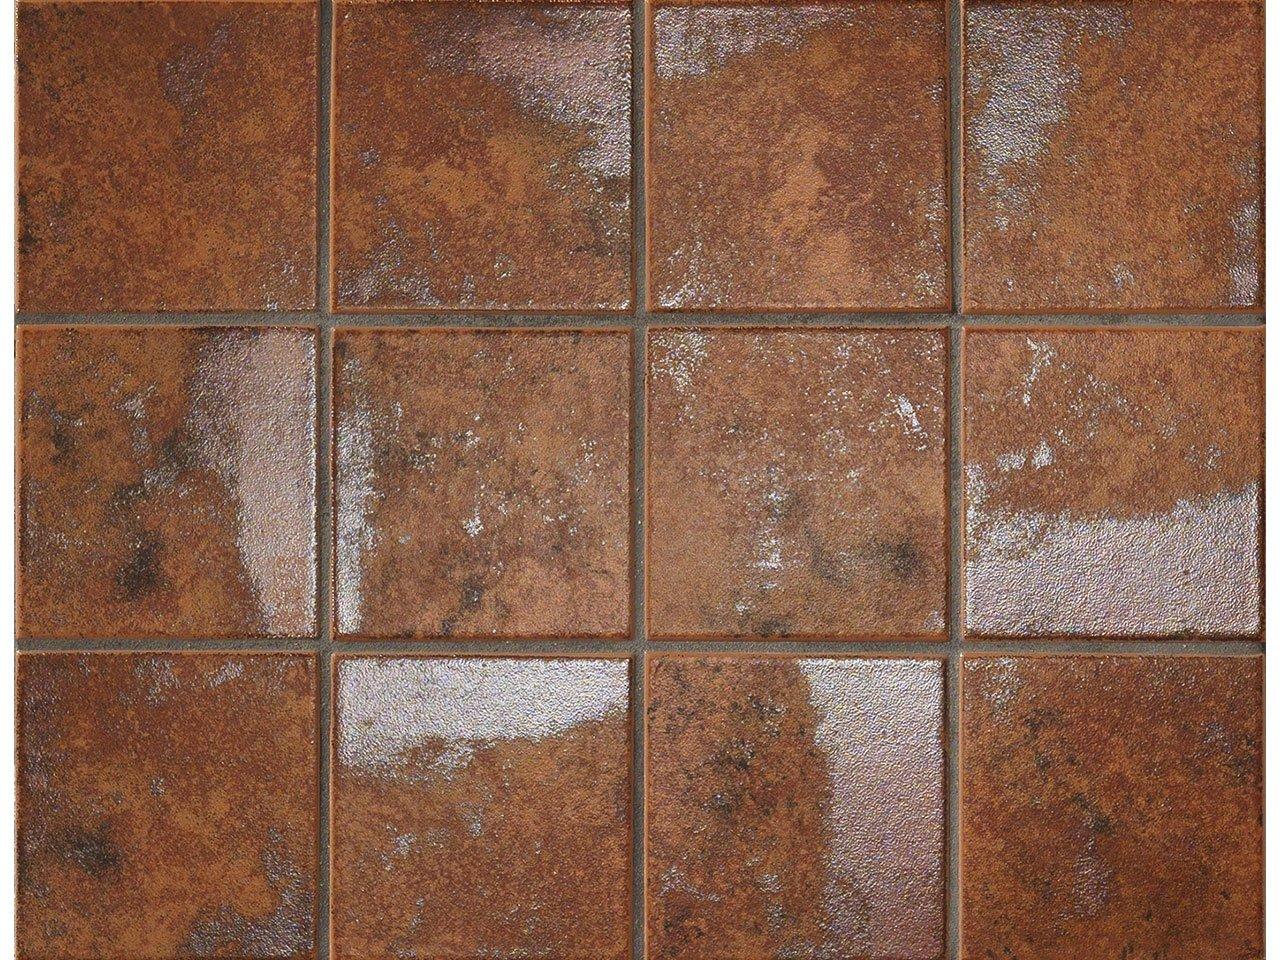 Ancona rust sfuso porc 10x10 iperceramica - Paraspigoli per piastrelle ...